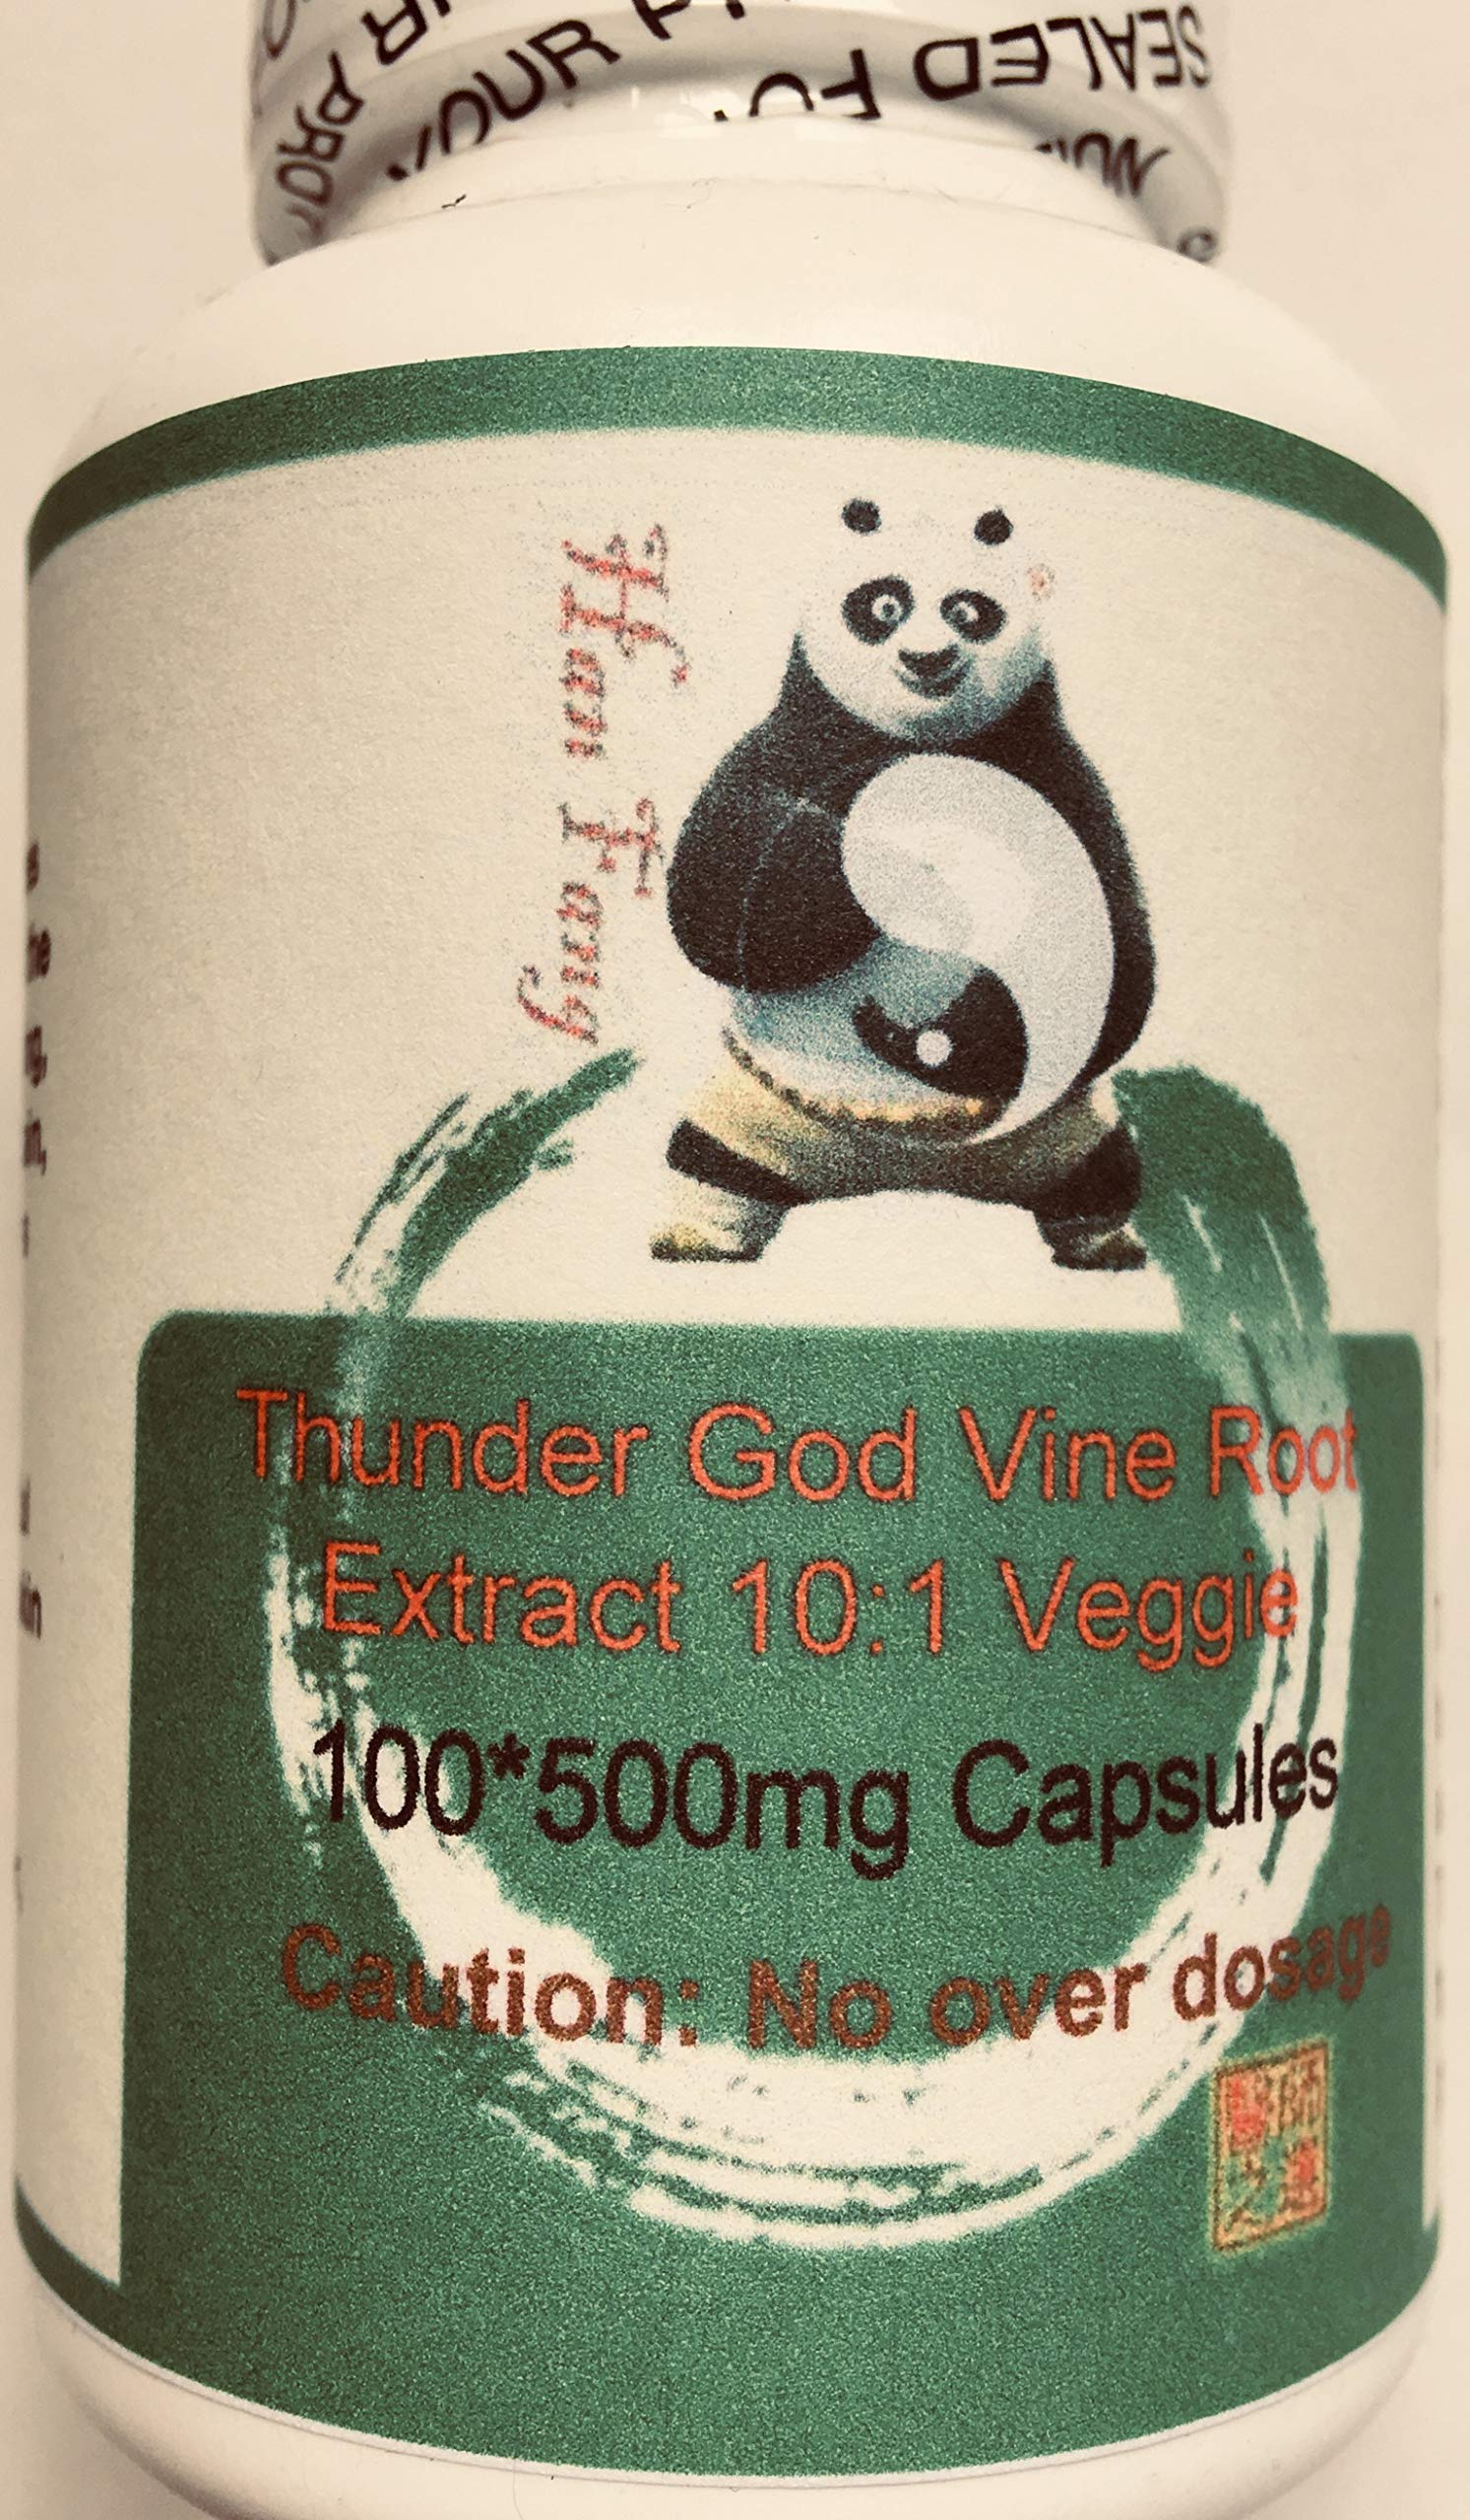 100 * 500mg Vegi-Capsules of Tripterygium Wilfordii, Thunder God Vine Root, Lei Gong Teng 10:1 Granules 50g by Baicao by Treasure of the East